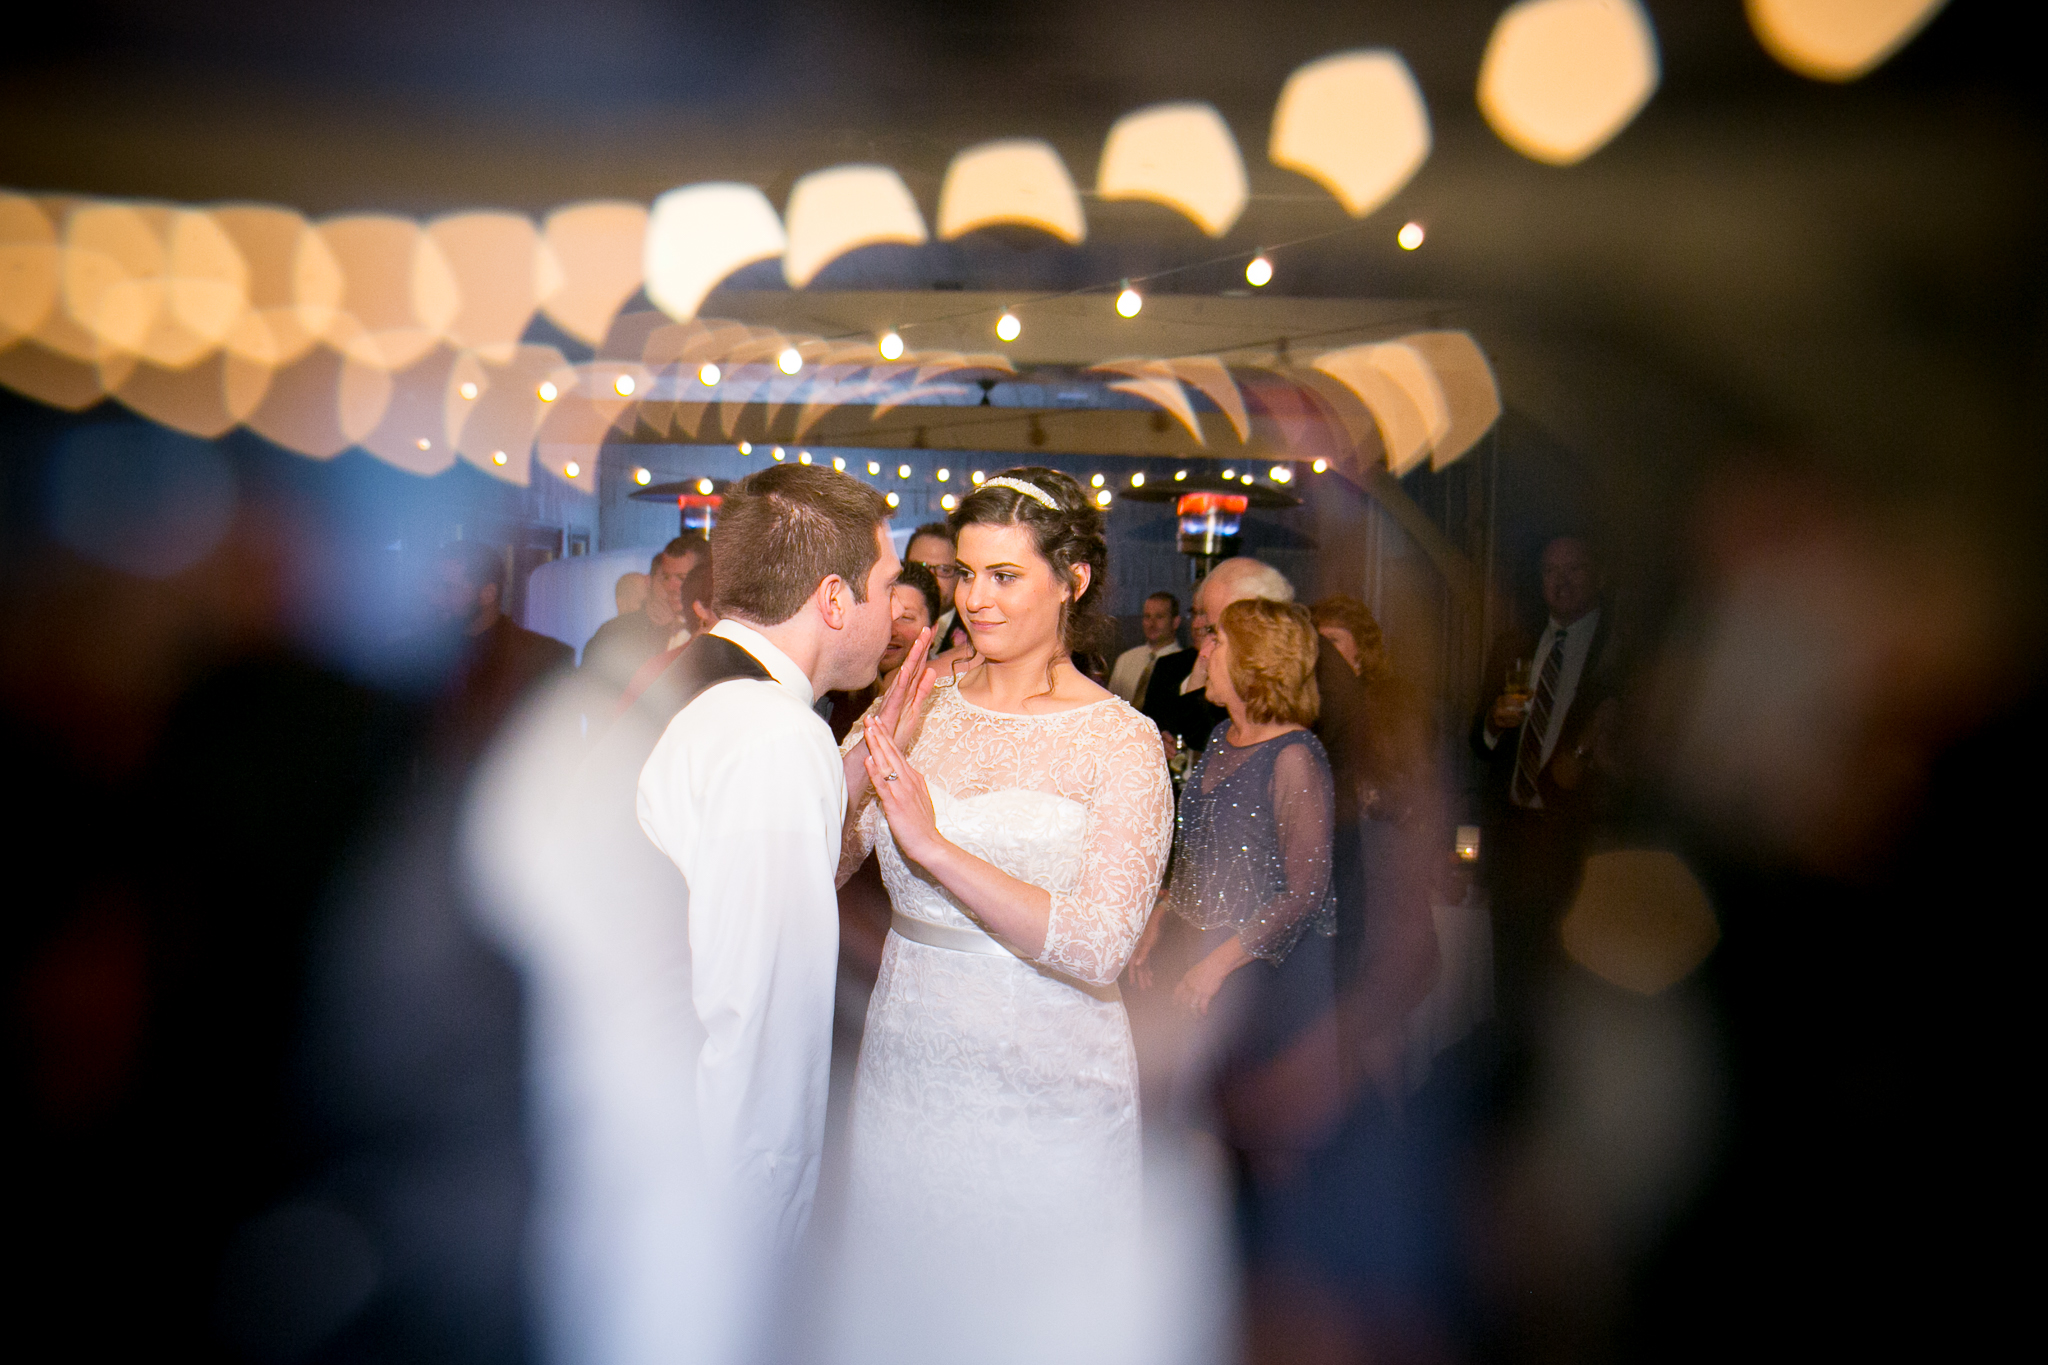 camuglia-whomstudio-chelsea_and_andy-nycphotographer-wedding-brooklyn-buffalo-timberlodge-131-5640.jpg